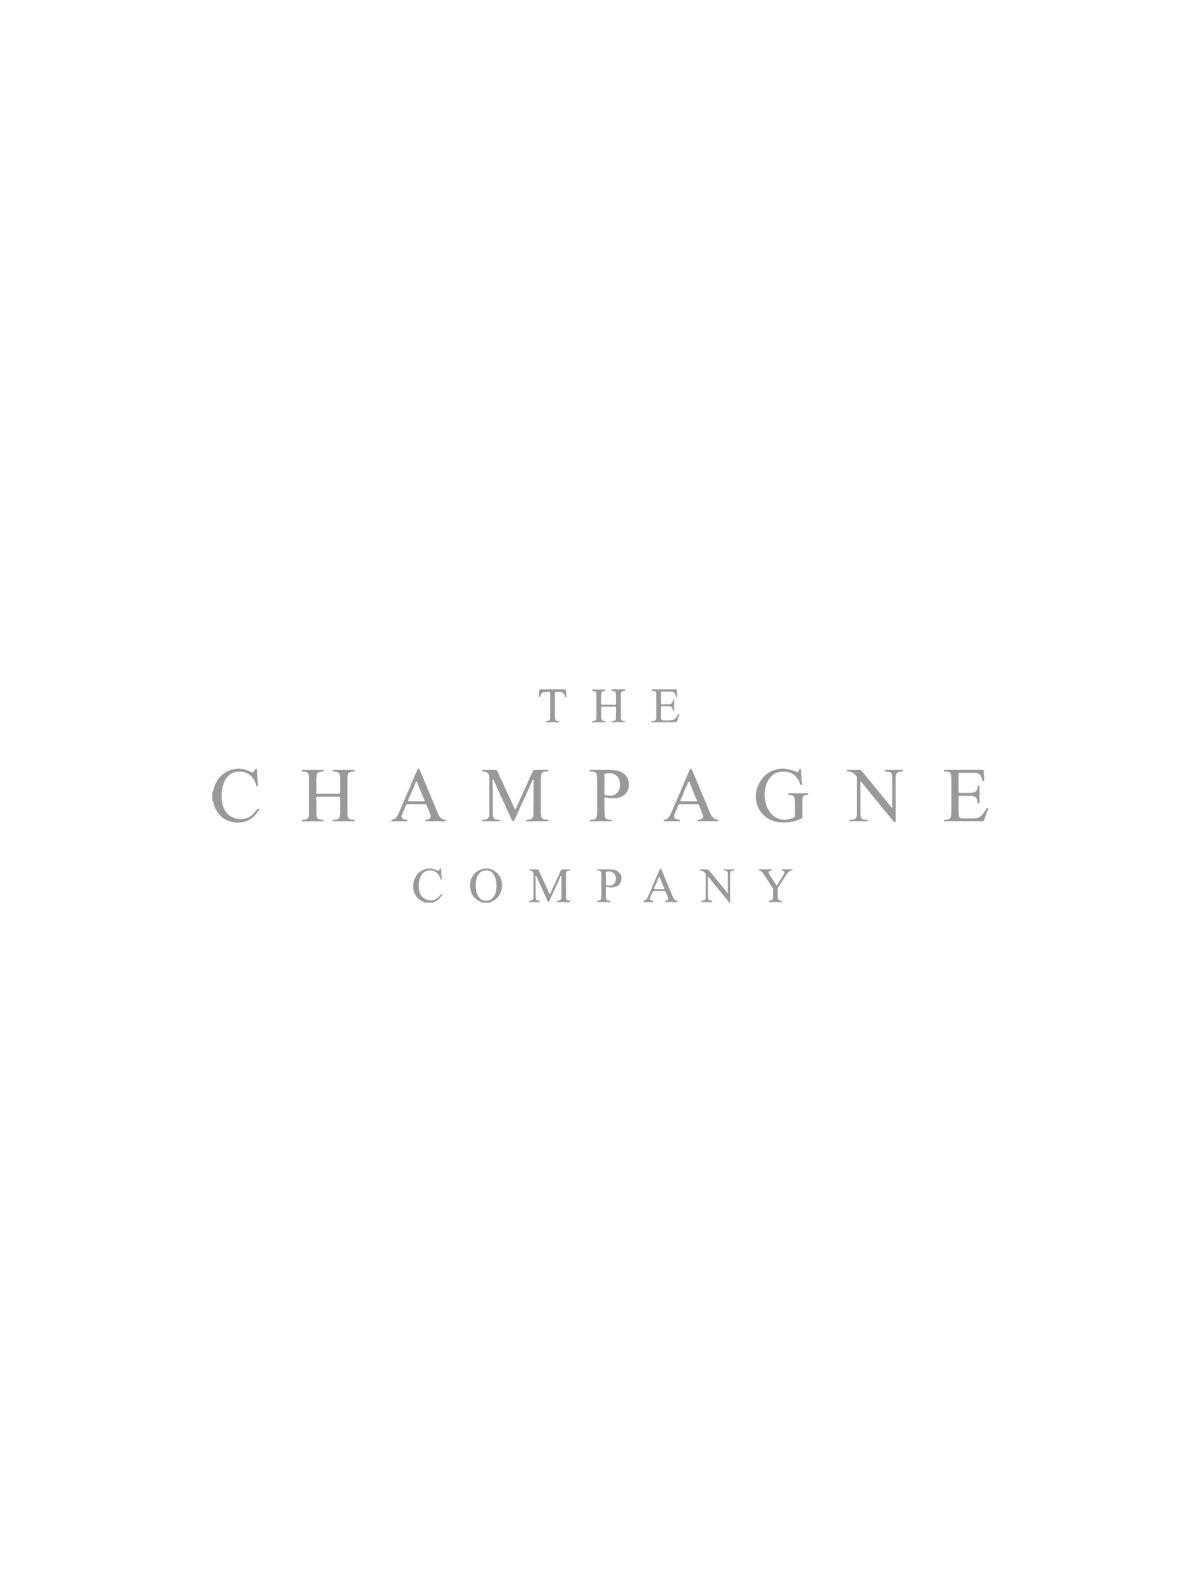 Dom Perignon 2009 Vintage Champagne Tokujin Yoshioka Edition 75cl